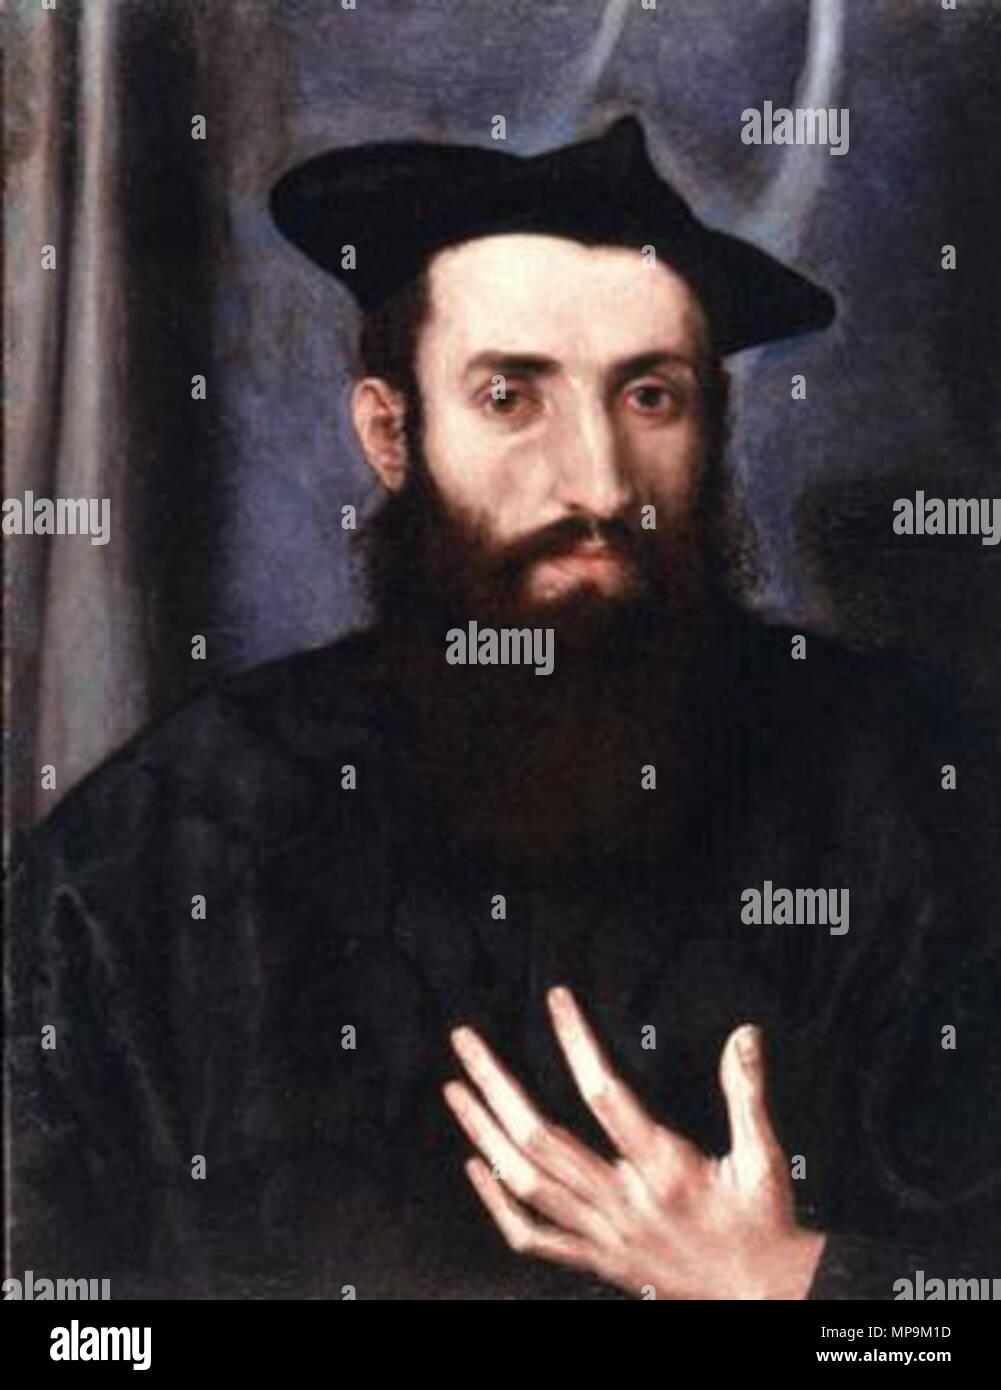 . Portrait of Giovanni Maria Pizoni . 16th century.   Lorenzo Lotto (1480–)   Description Italian painter and fresco painter  Date of birth/death circa 1480 1556 / 1557  Location of birth/death Venice Loreto  Work location Recanati (1506-1508), Venice (1500), Treviso (1503-1506), Rome (1509-1512), Bergamo (1513-1525), Venice (1513-1517), Treviso (1525-1527), Venice (1527-1529), Loreto, Venice (1529-1539), Treviso (1540-1549), Ancona (1549), Loreto (1556)  Authority control  : Q310973 VIAF:22165049 ISNI:0000 0001 2320 0265 ULAN:500015631 LCCN:n50042418 NLA:35692463 WorldCat 820 Lorenzo - Stock Image